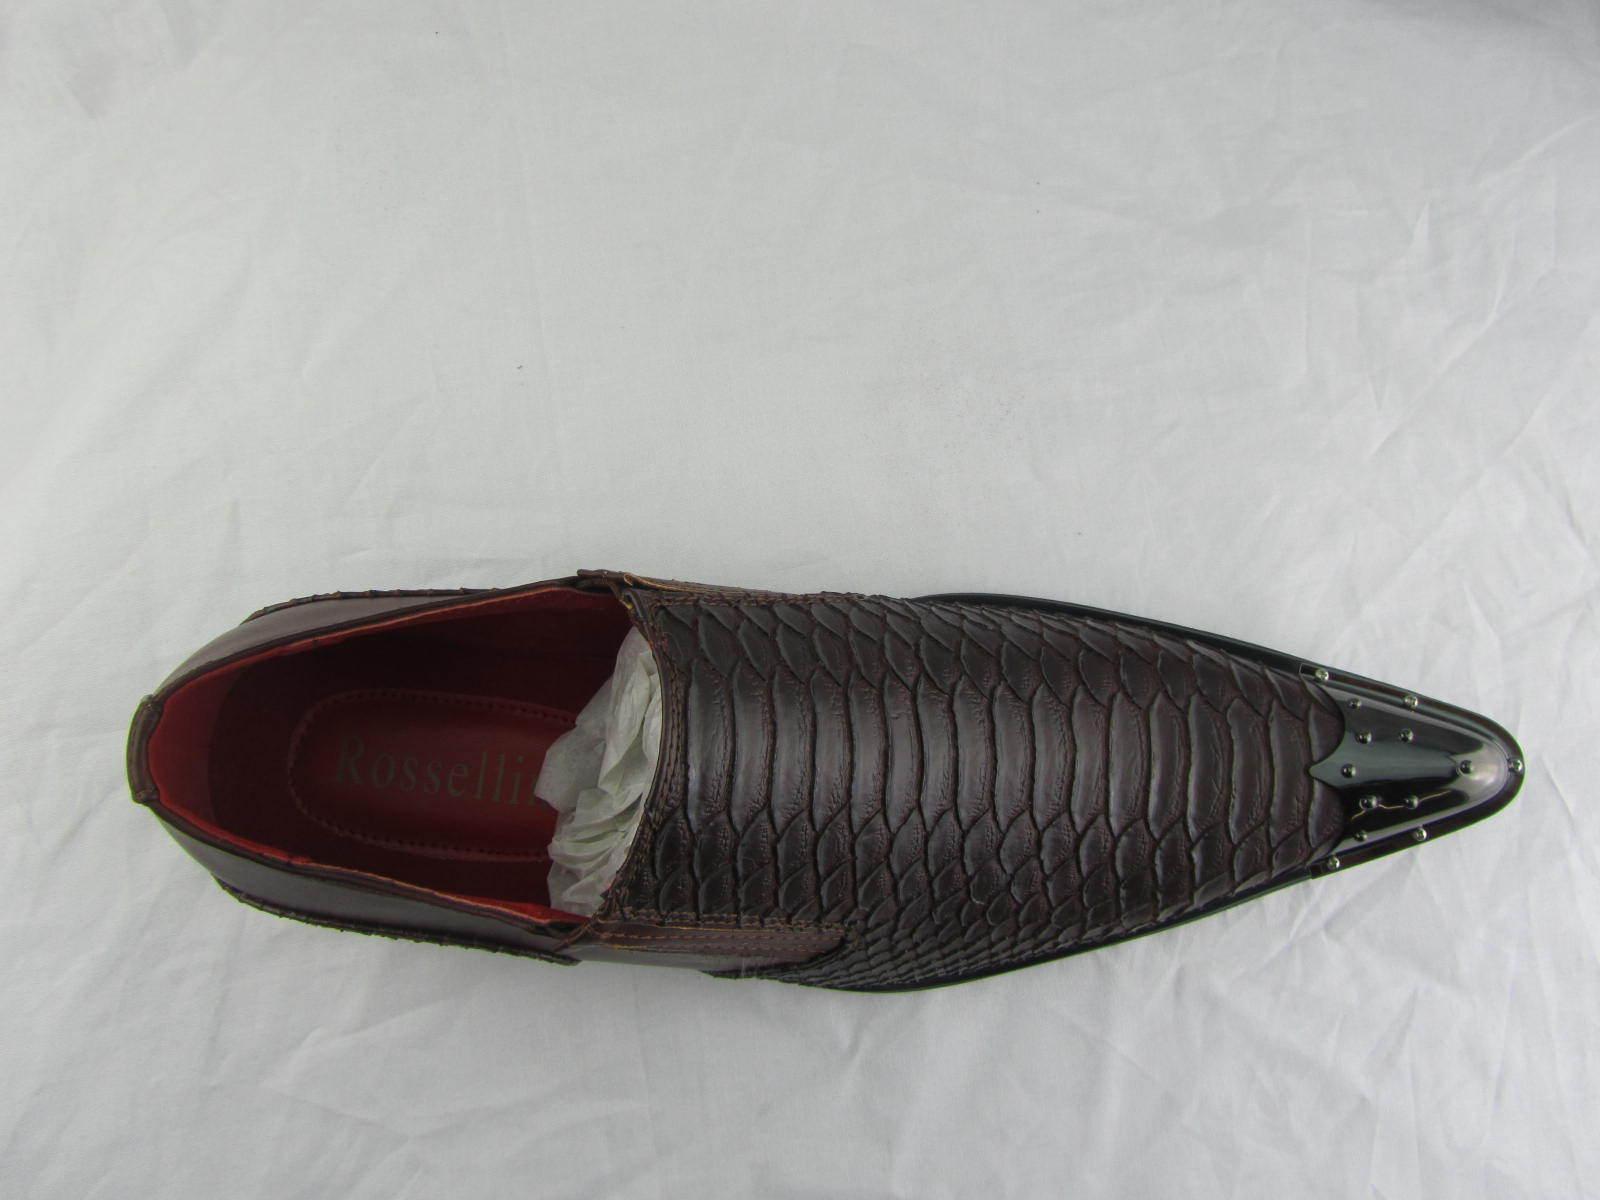 Rossellini Benitez Benitez Benitez hombreS Zapatos Marrón Leather Lined Metal Pointed Rock Zapatos e60447